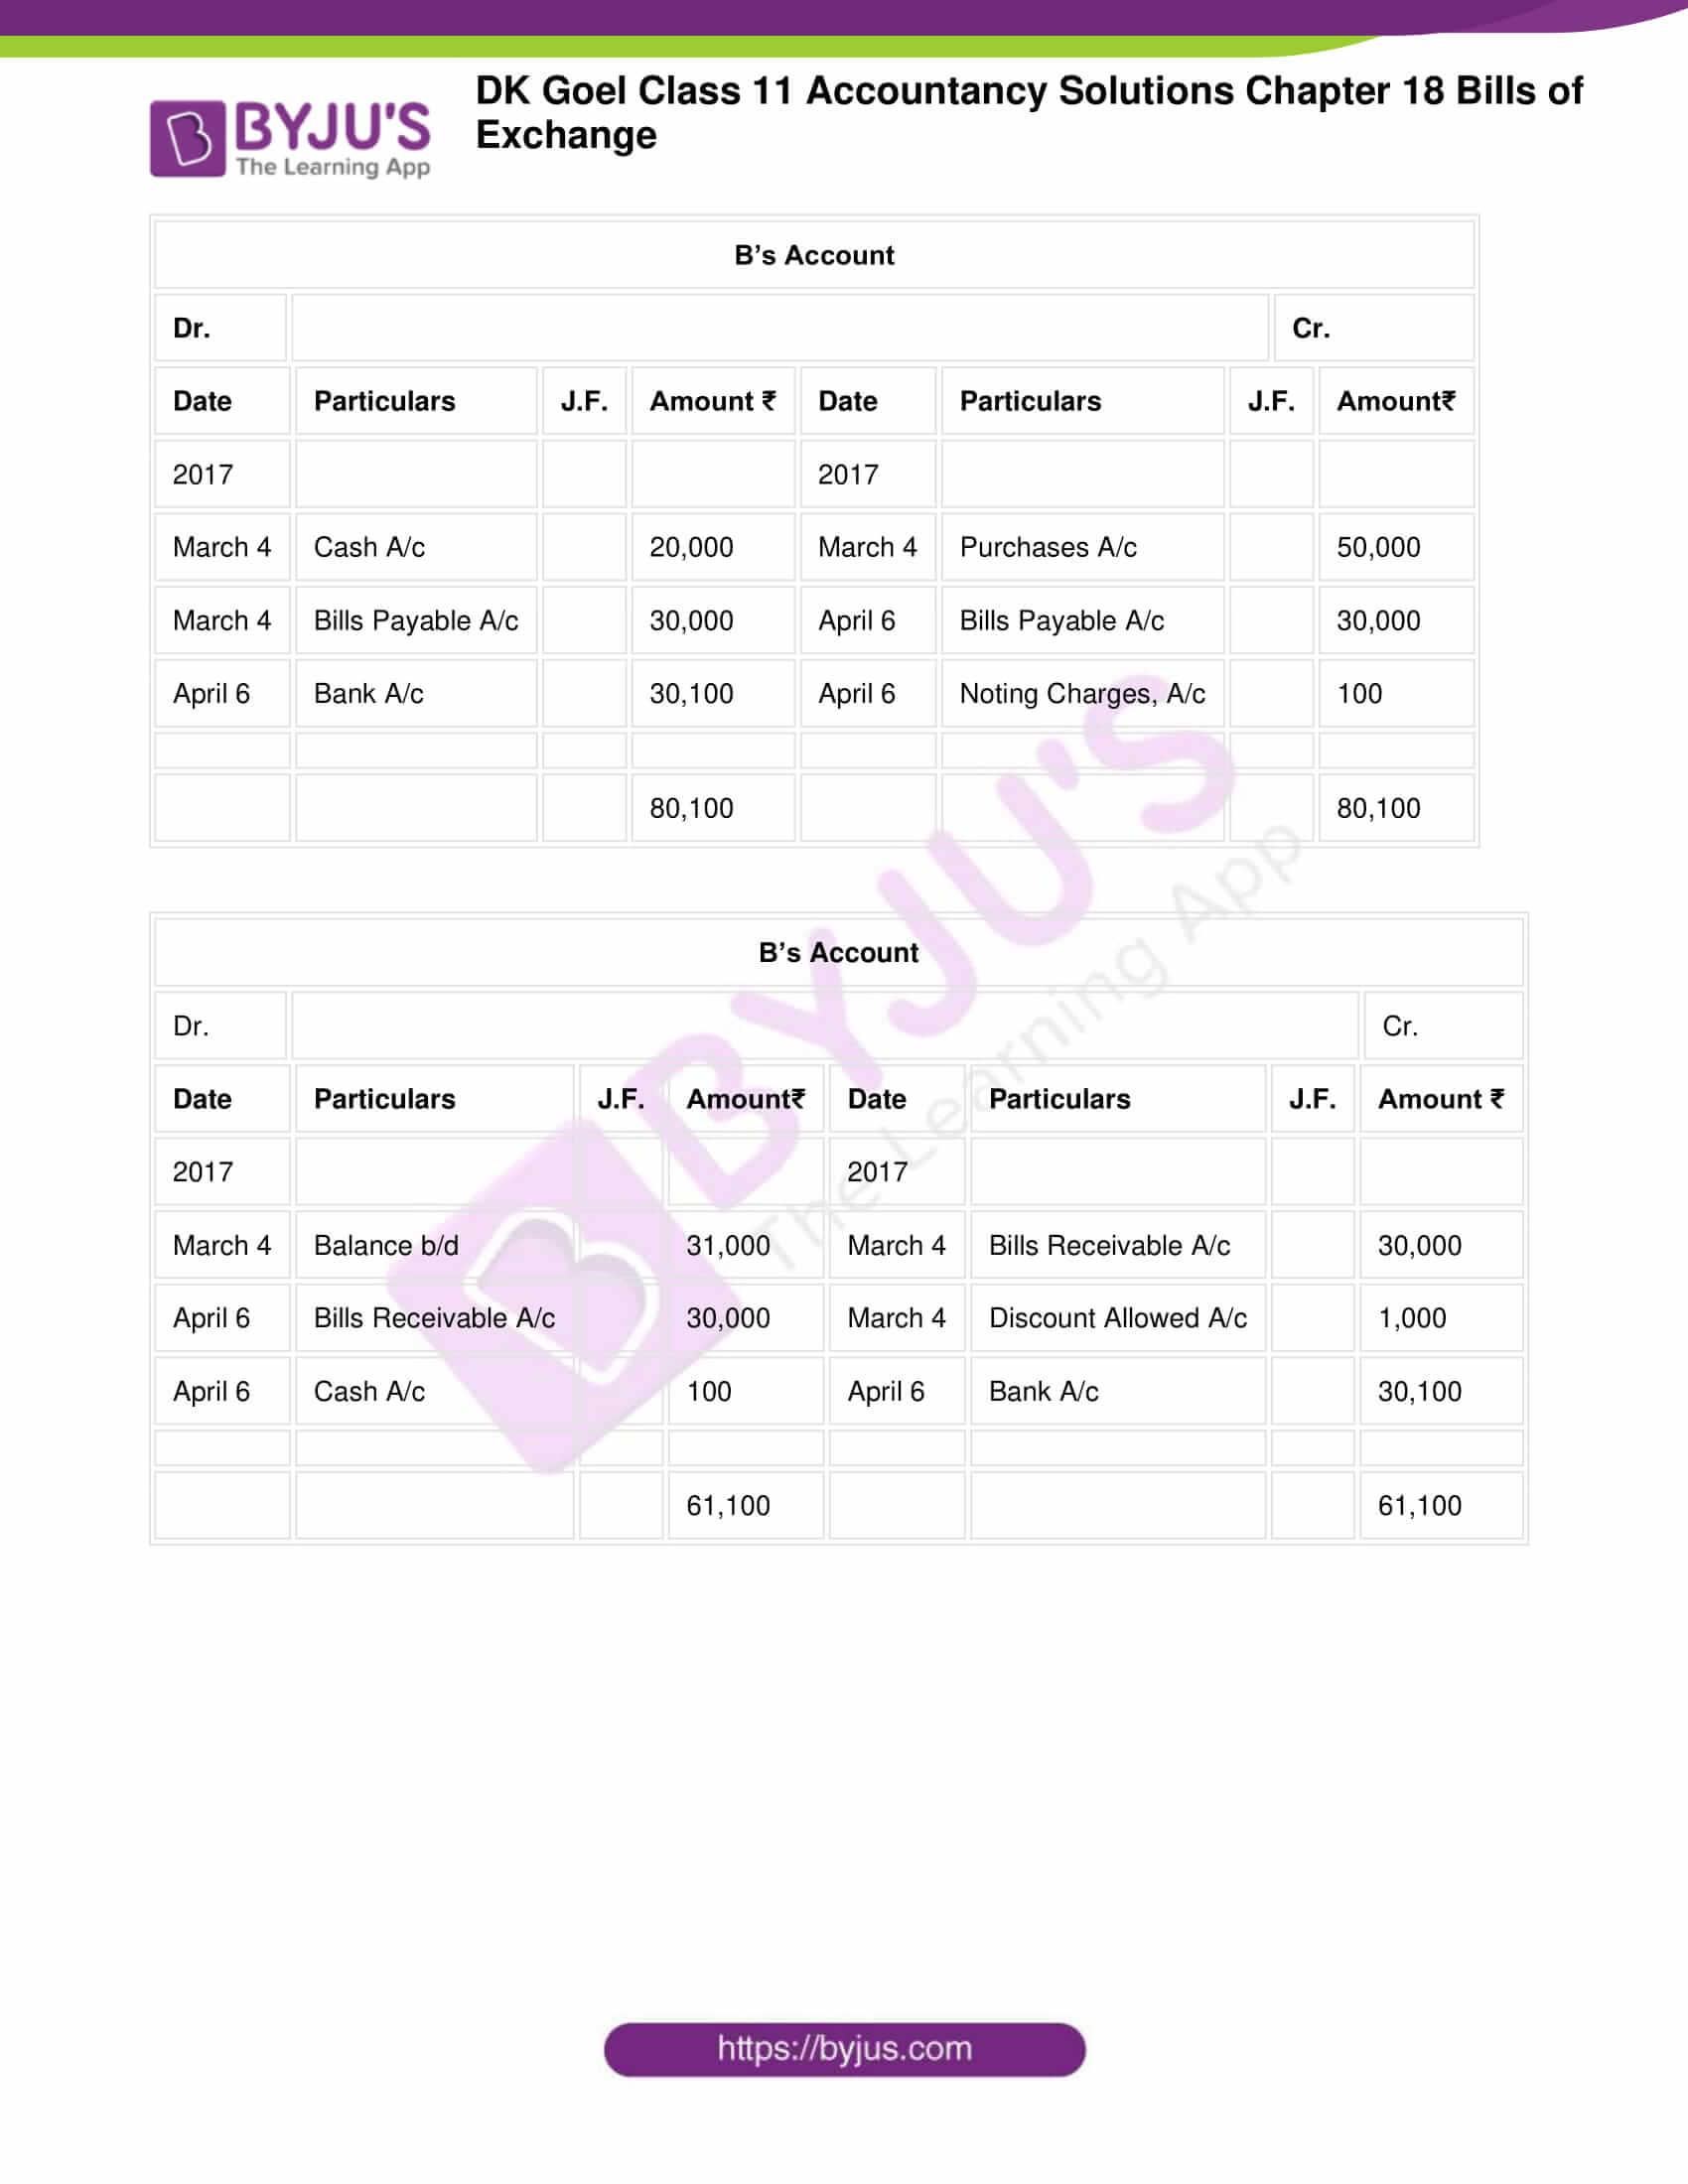 dk goel class 11 accountancy solutions chapter 18 058